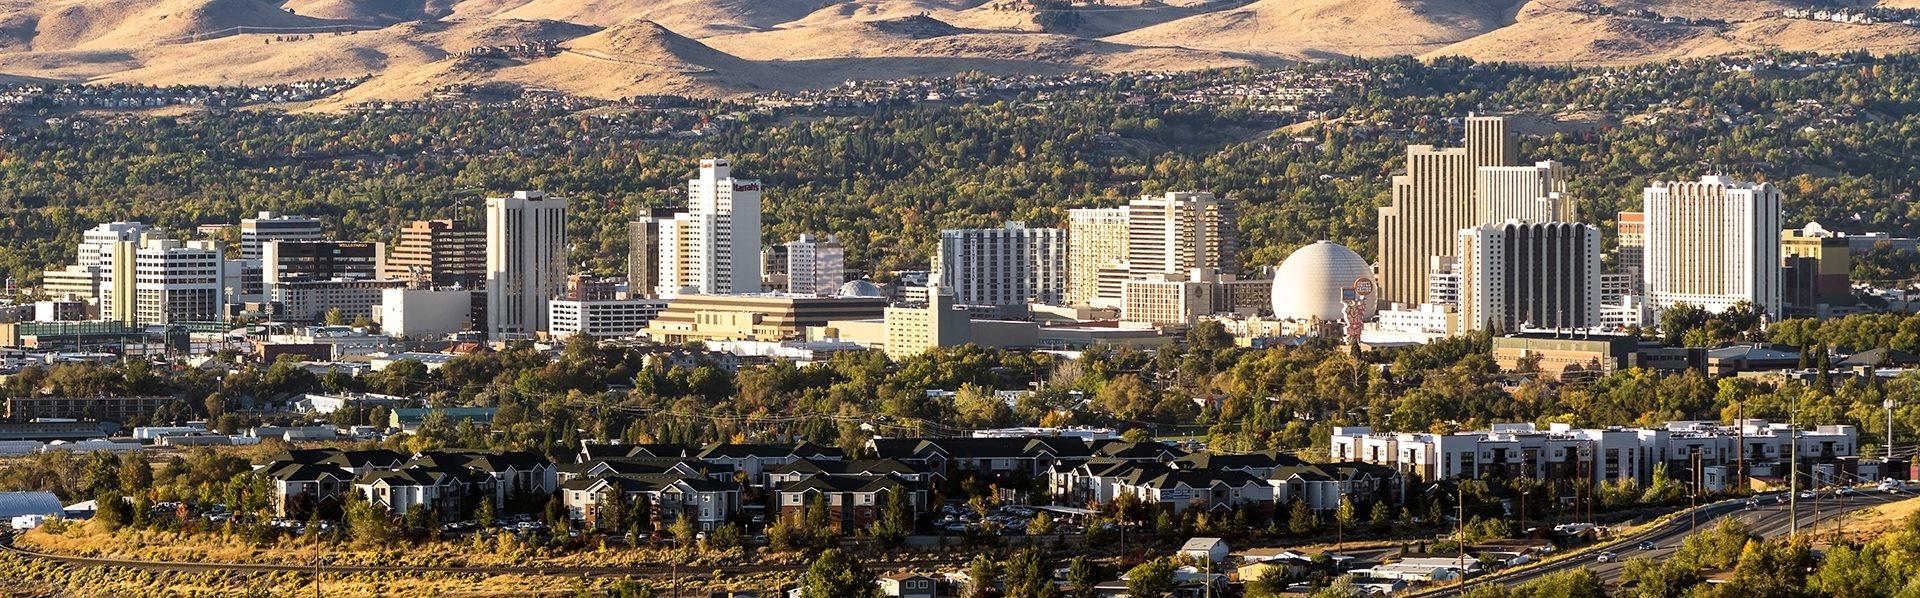 RENO NV City View SouthRidge Apts for rent Reno NV 89523